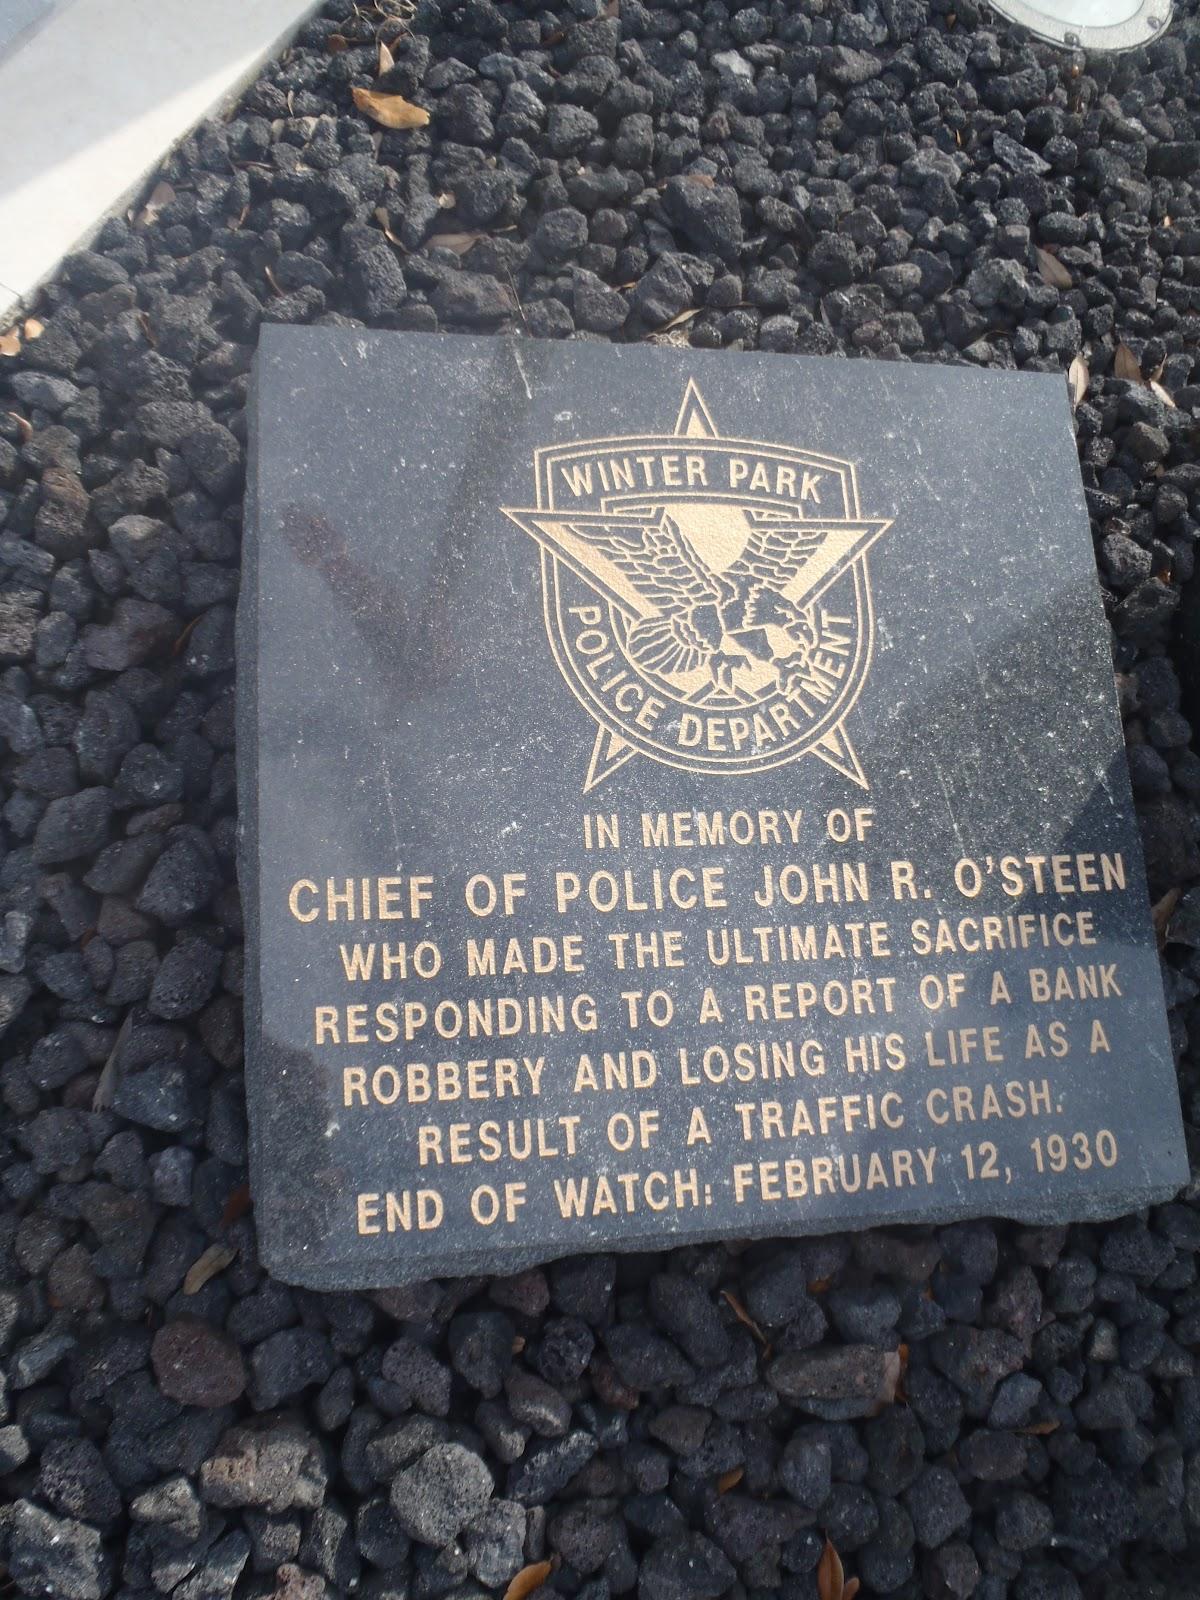 glimpses four 9 11 memorials in central florida the orlando